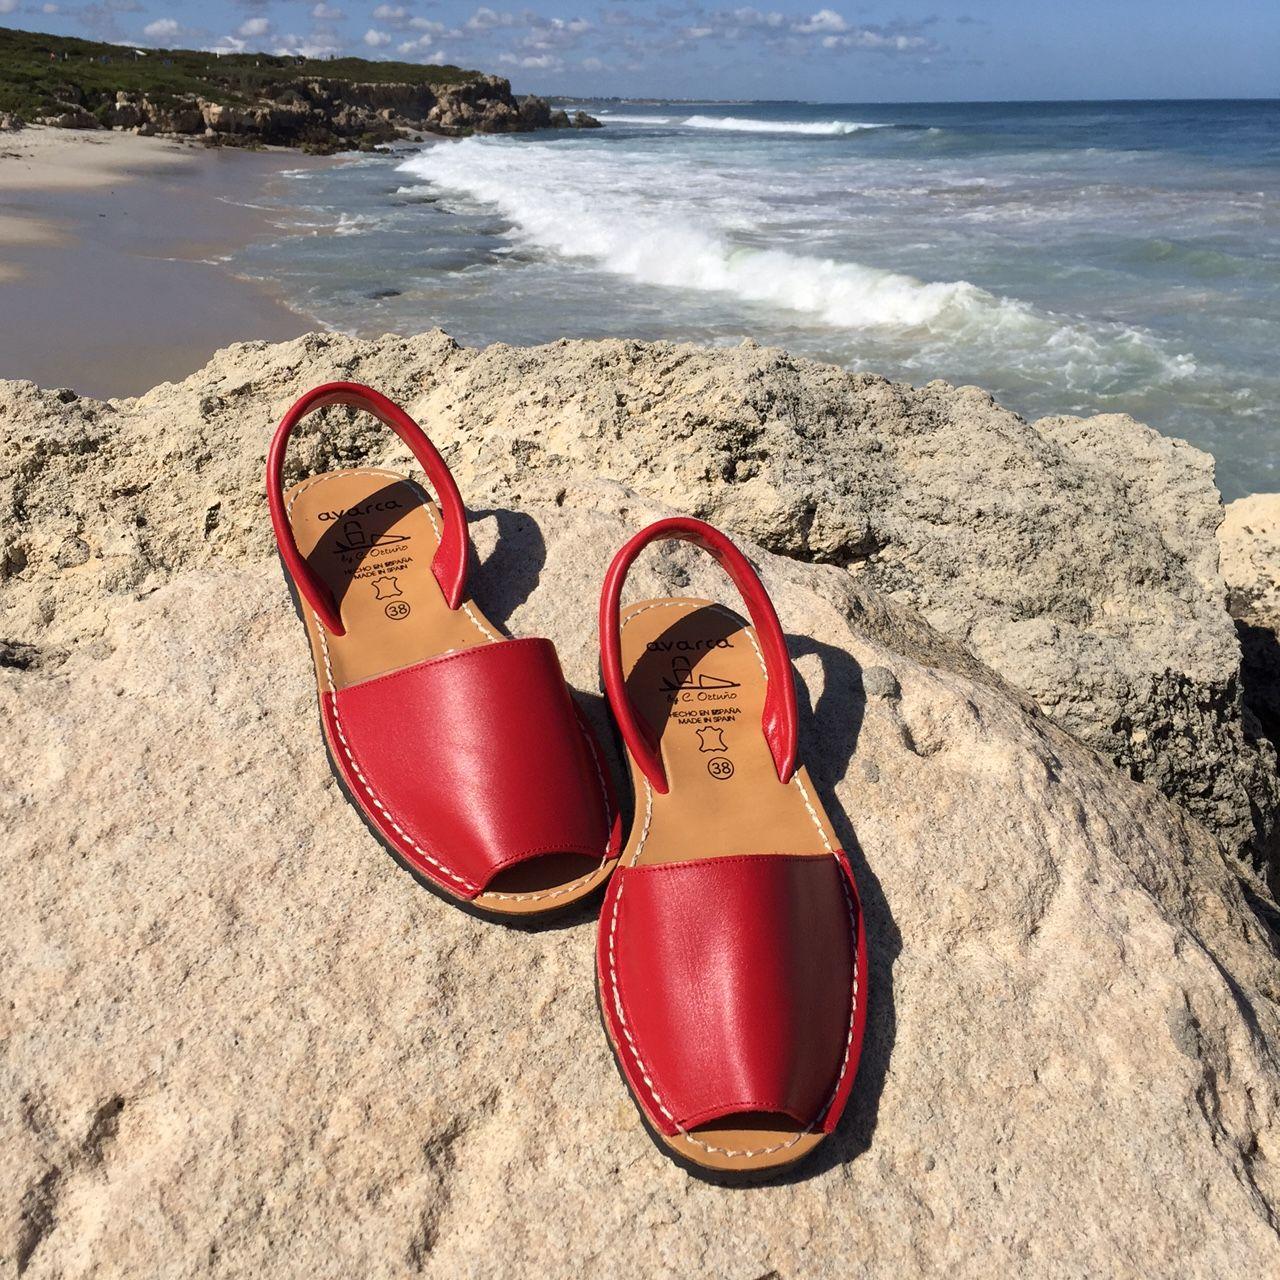 Sandals and Sunsets (sandalsandsunsets) on Pinterest